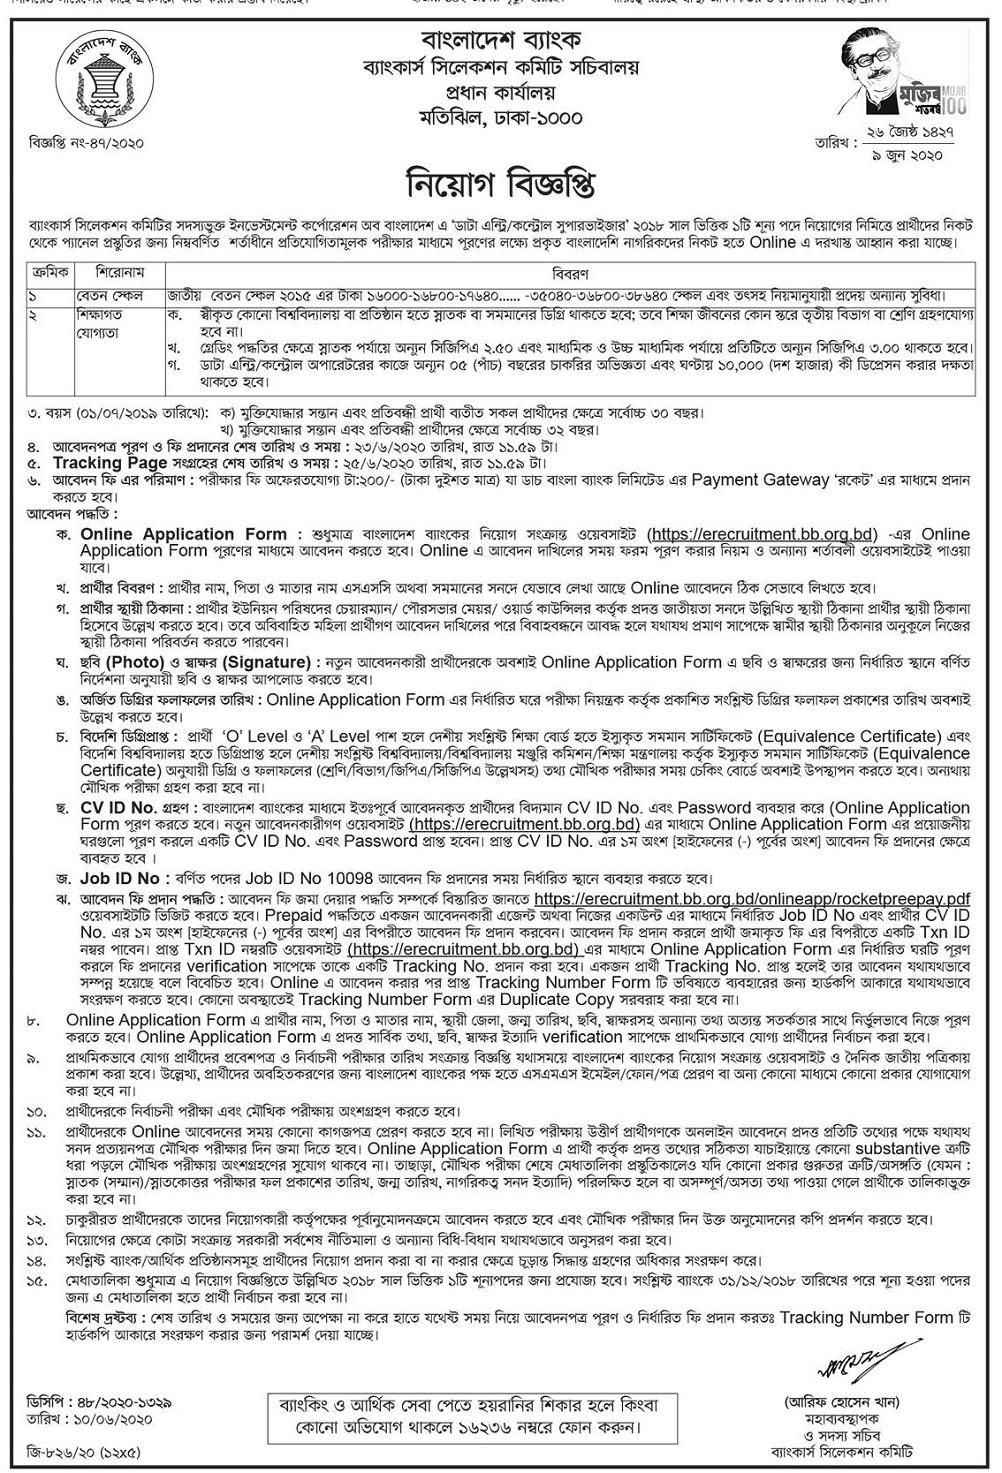 Bangladesh Bank BB Job Circular 2020